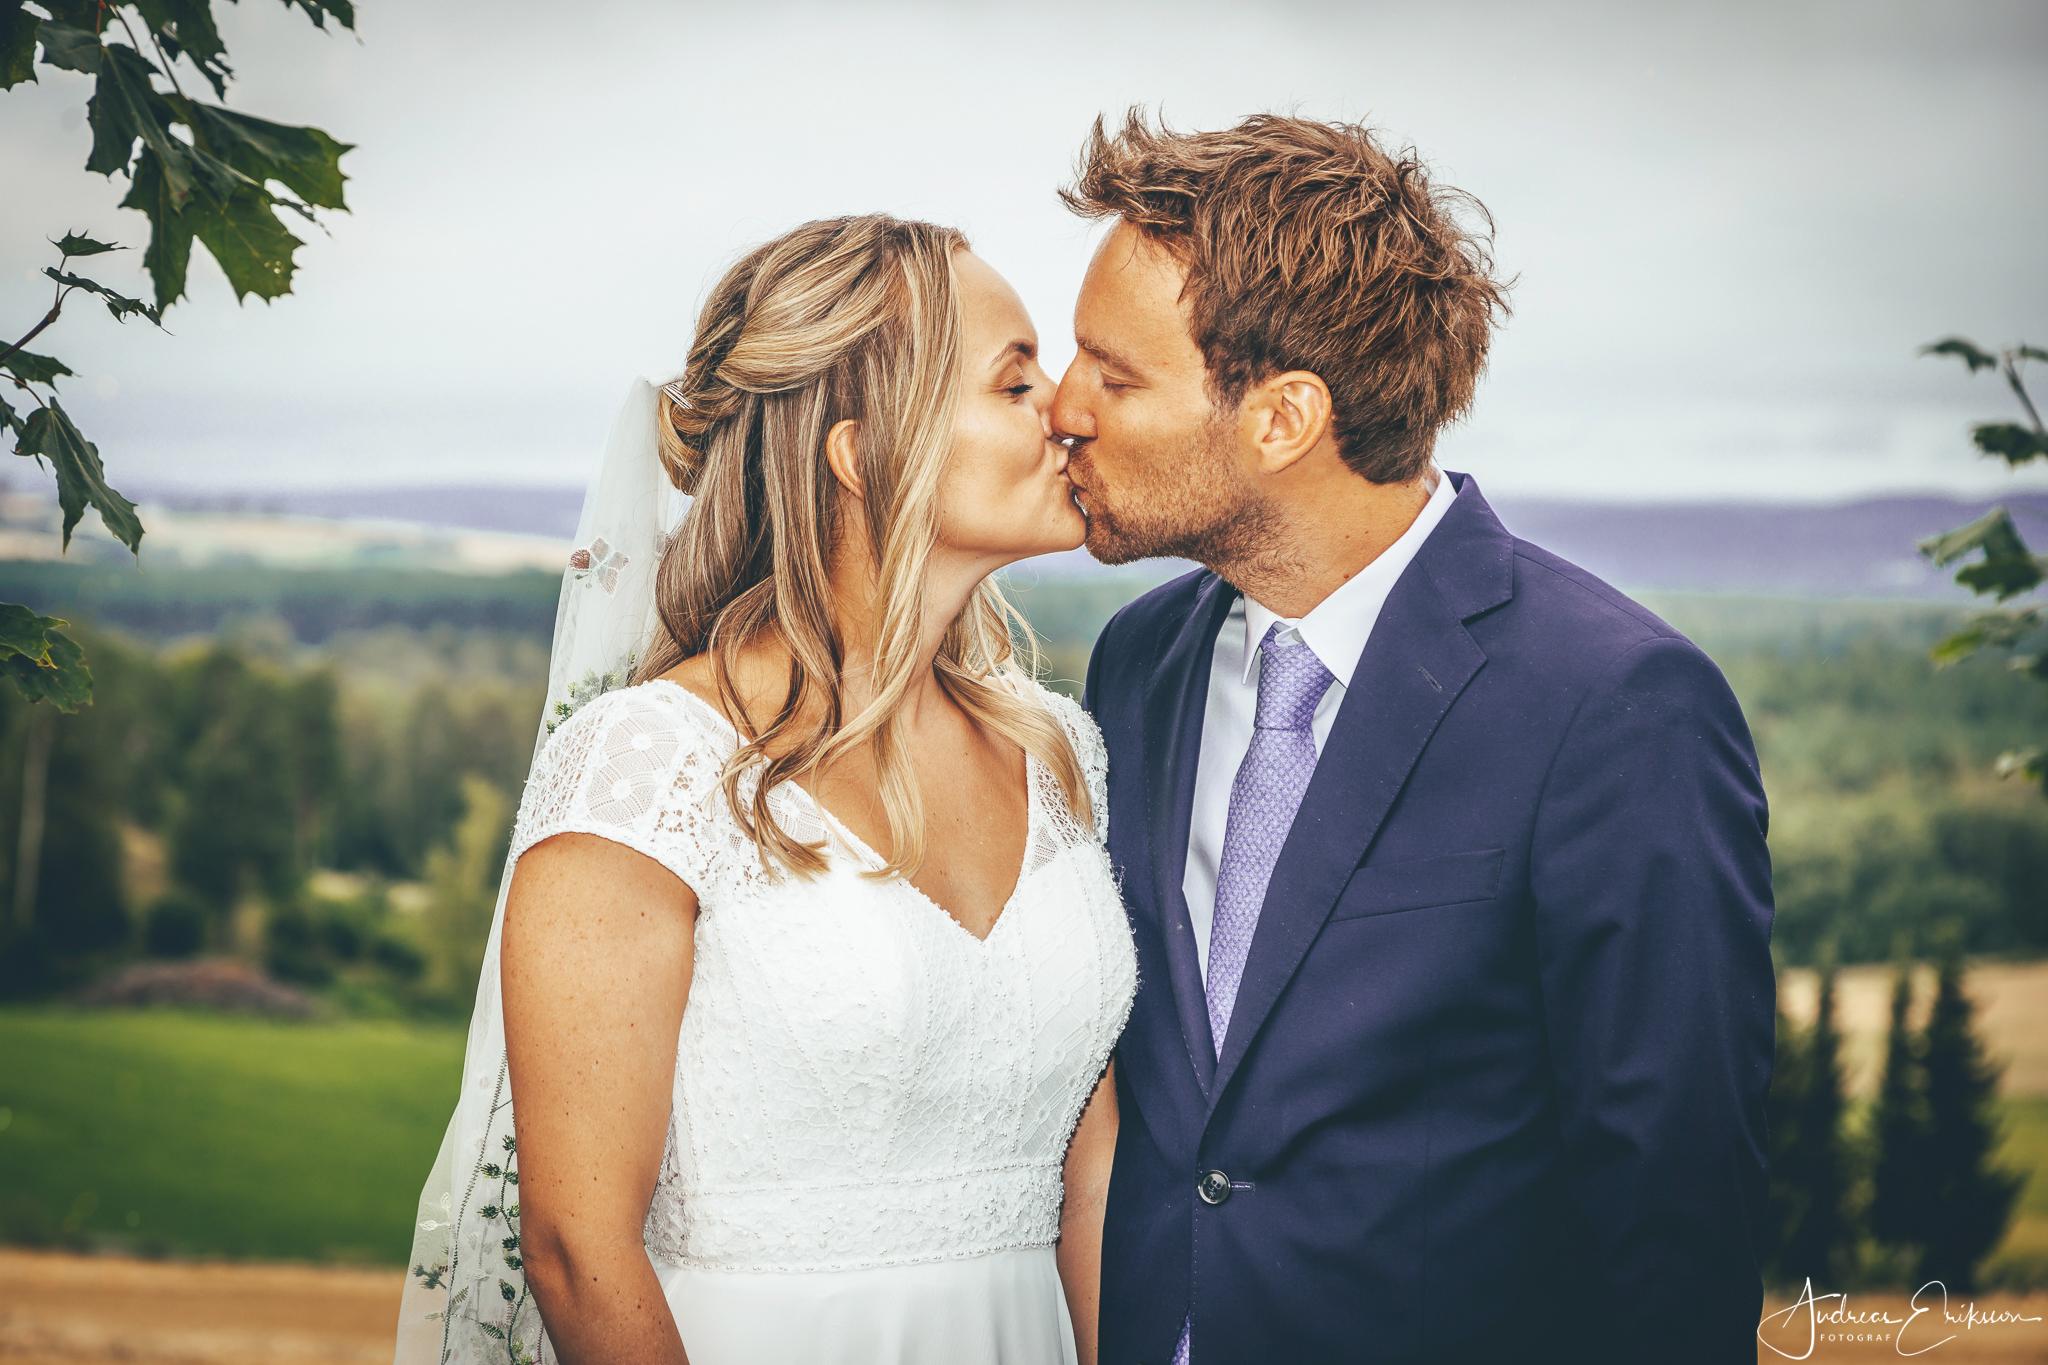 Bryllupssesongen 2021 går mot slutten